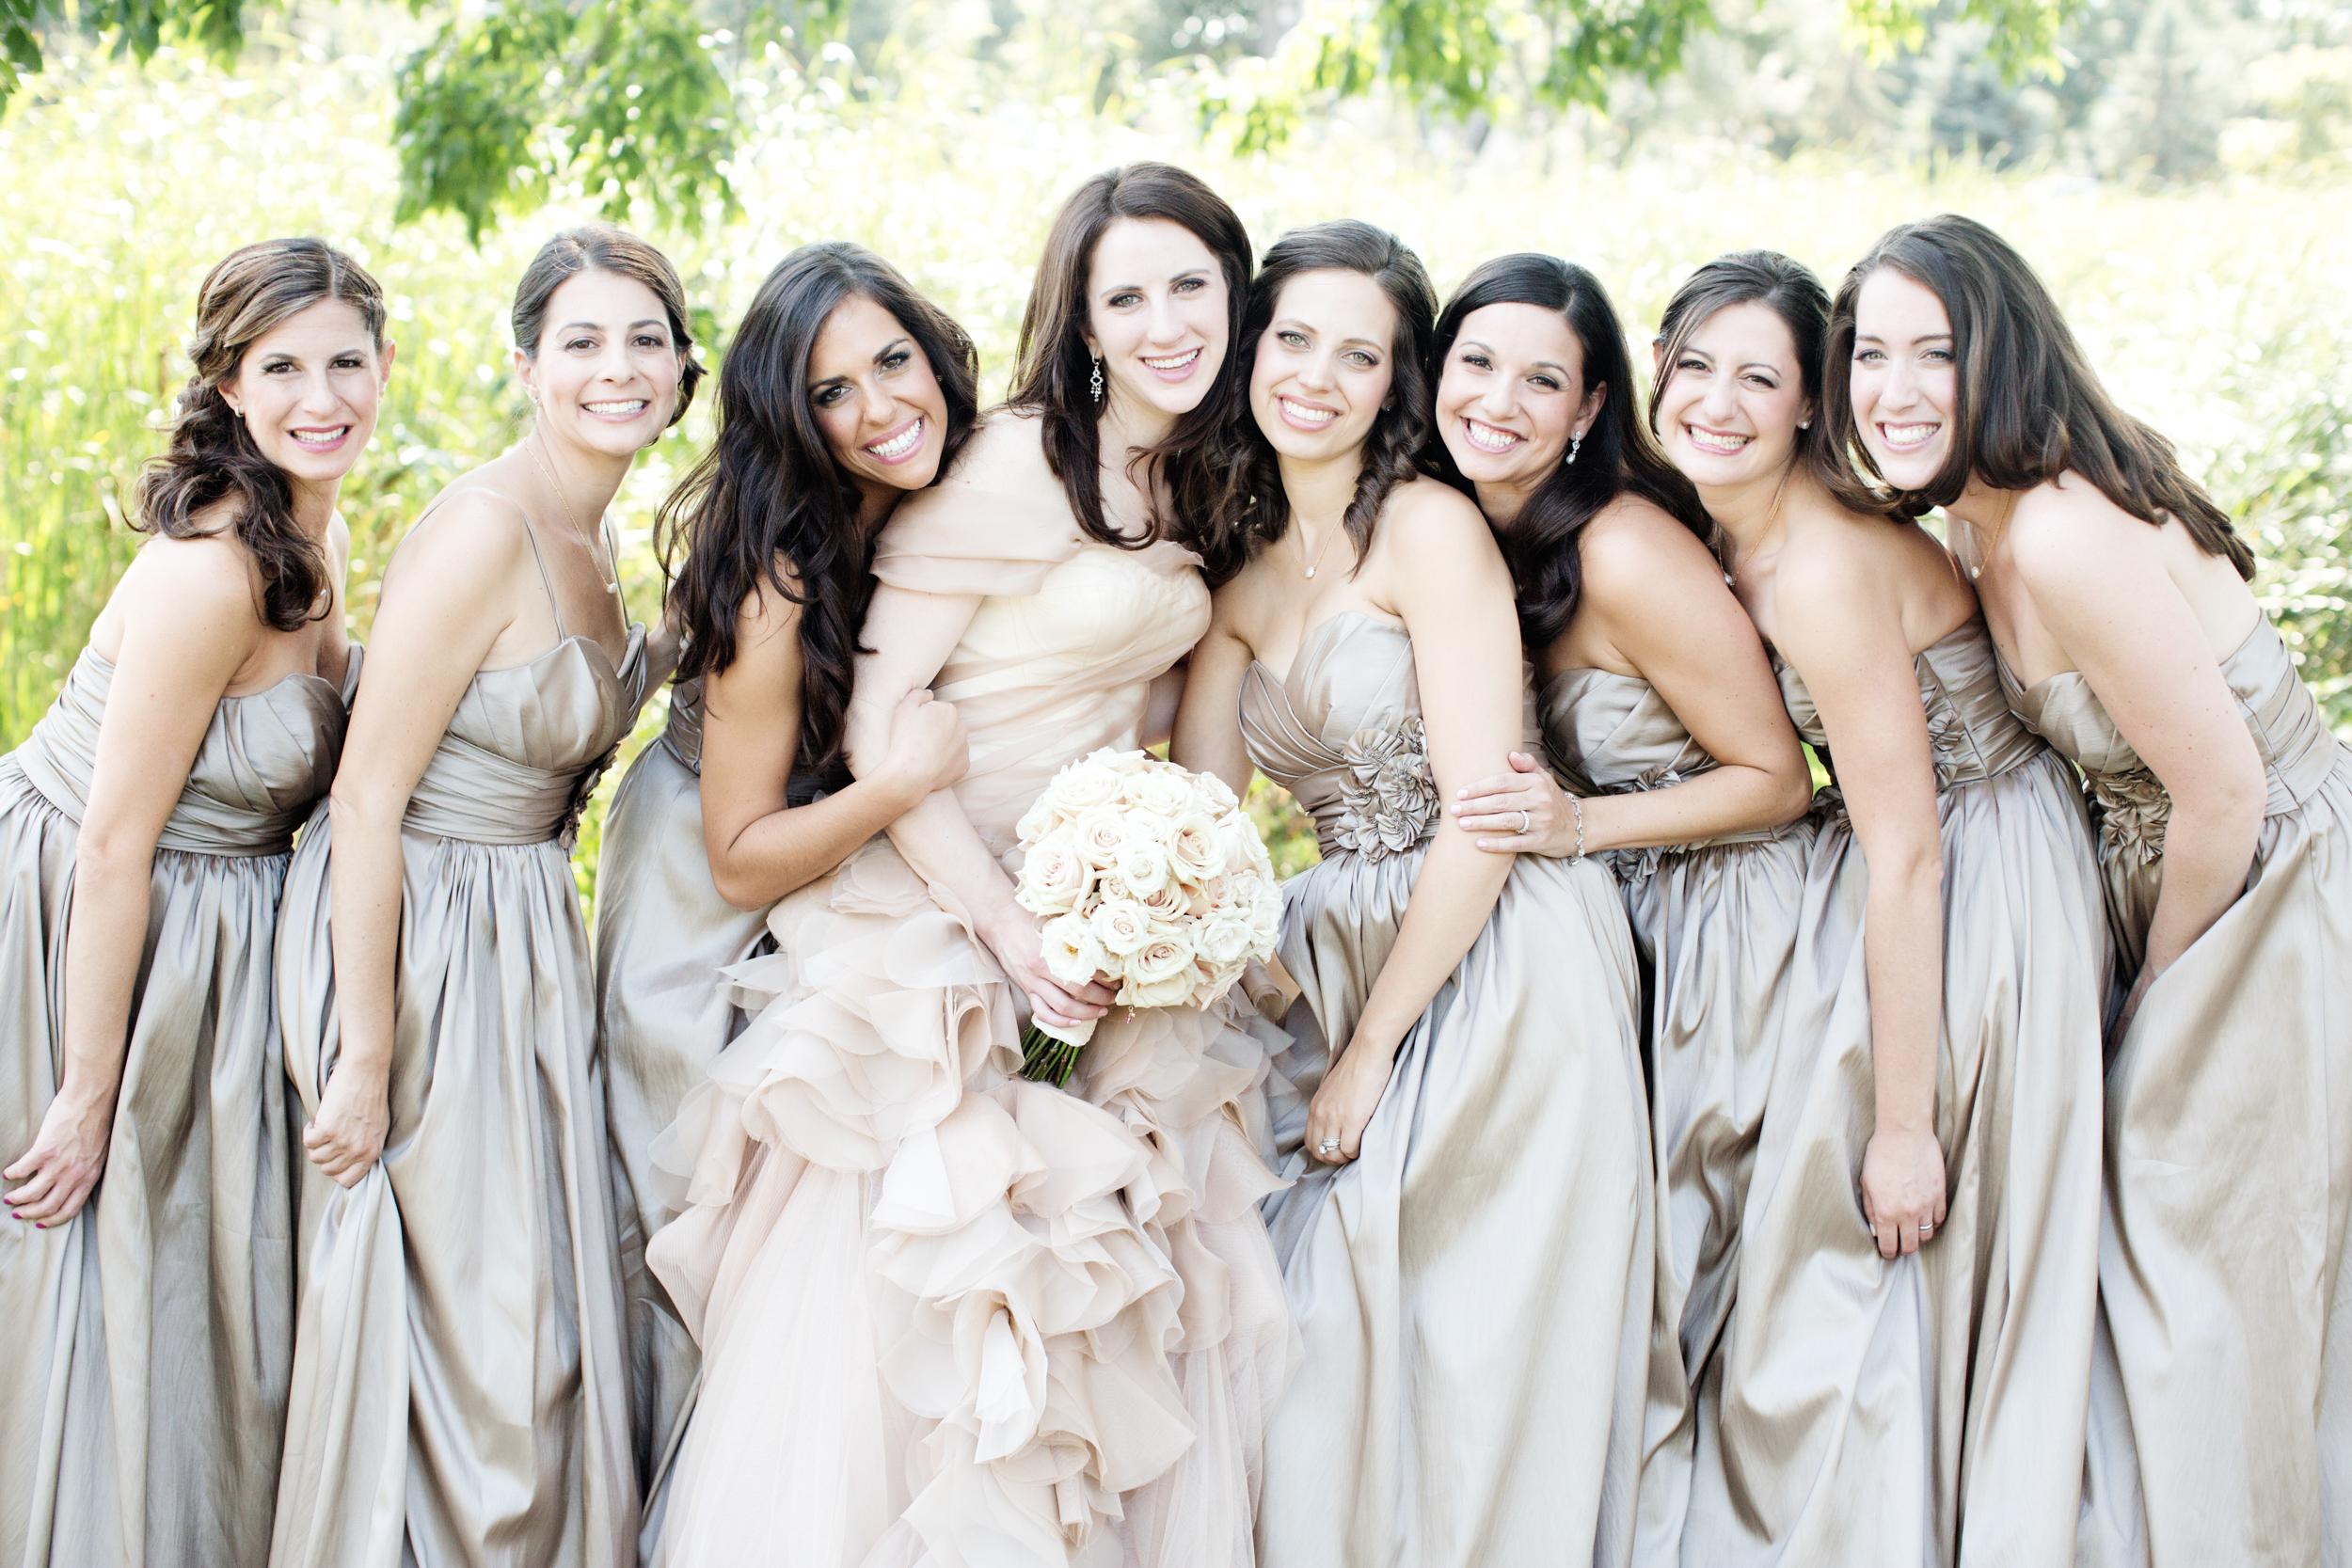 Ceci_New_York_Ceci_Style_Ceci_Johnson_Luxury_Lifestyle_Floral_Lace_Wedding_Letterpress_Inspiration_Design_Custom_Couture_Personalized_Invitations_-97.jpg